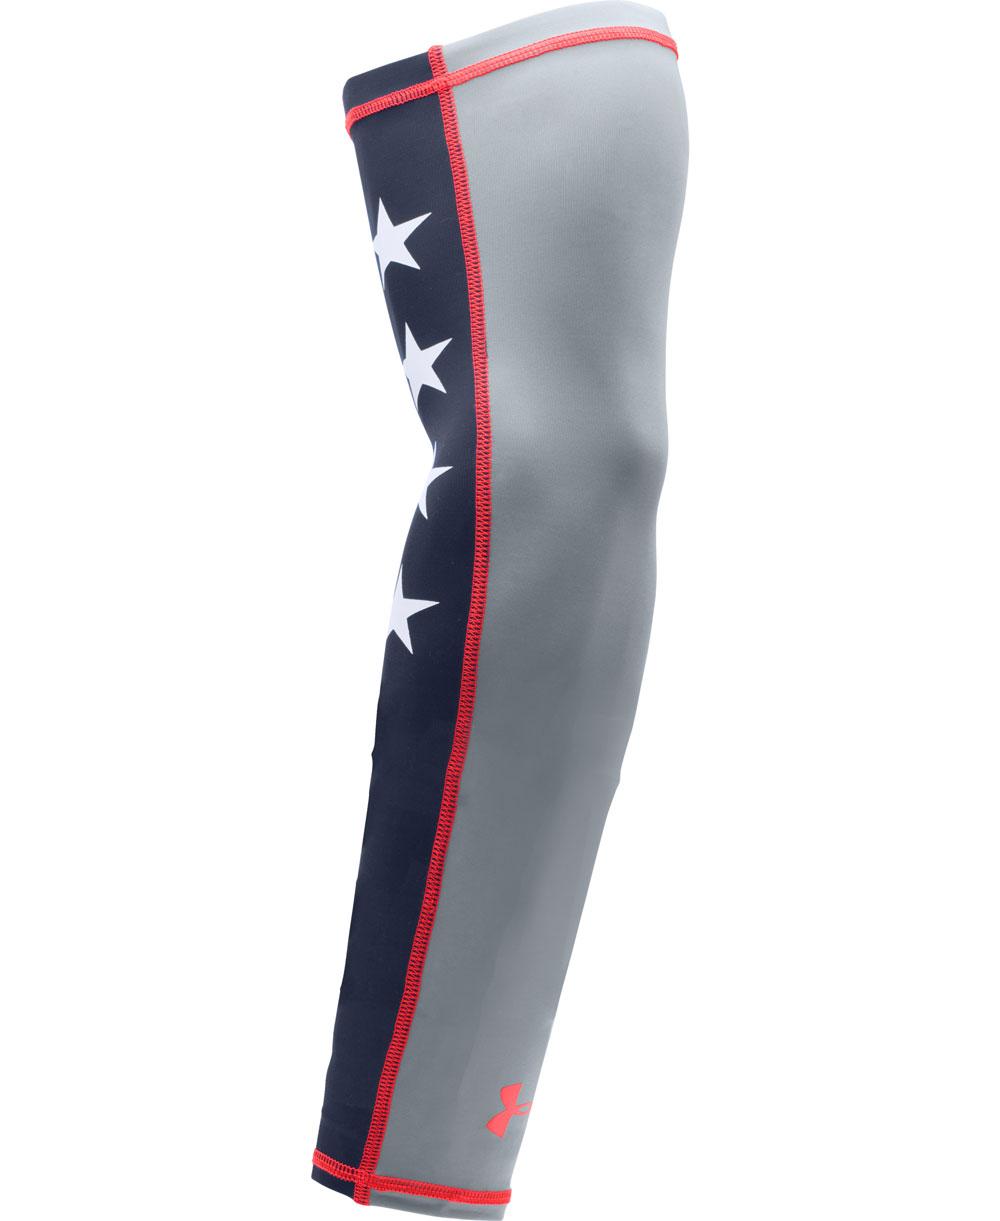 Graphic HeatGear Men's Baseball Arm Sleeve Steel